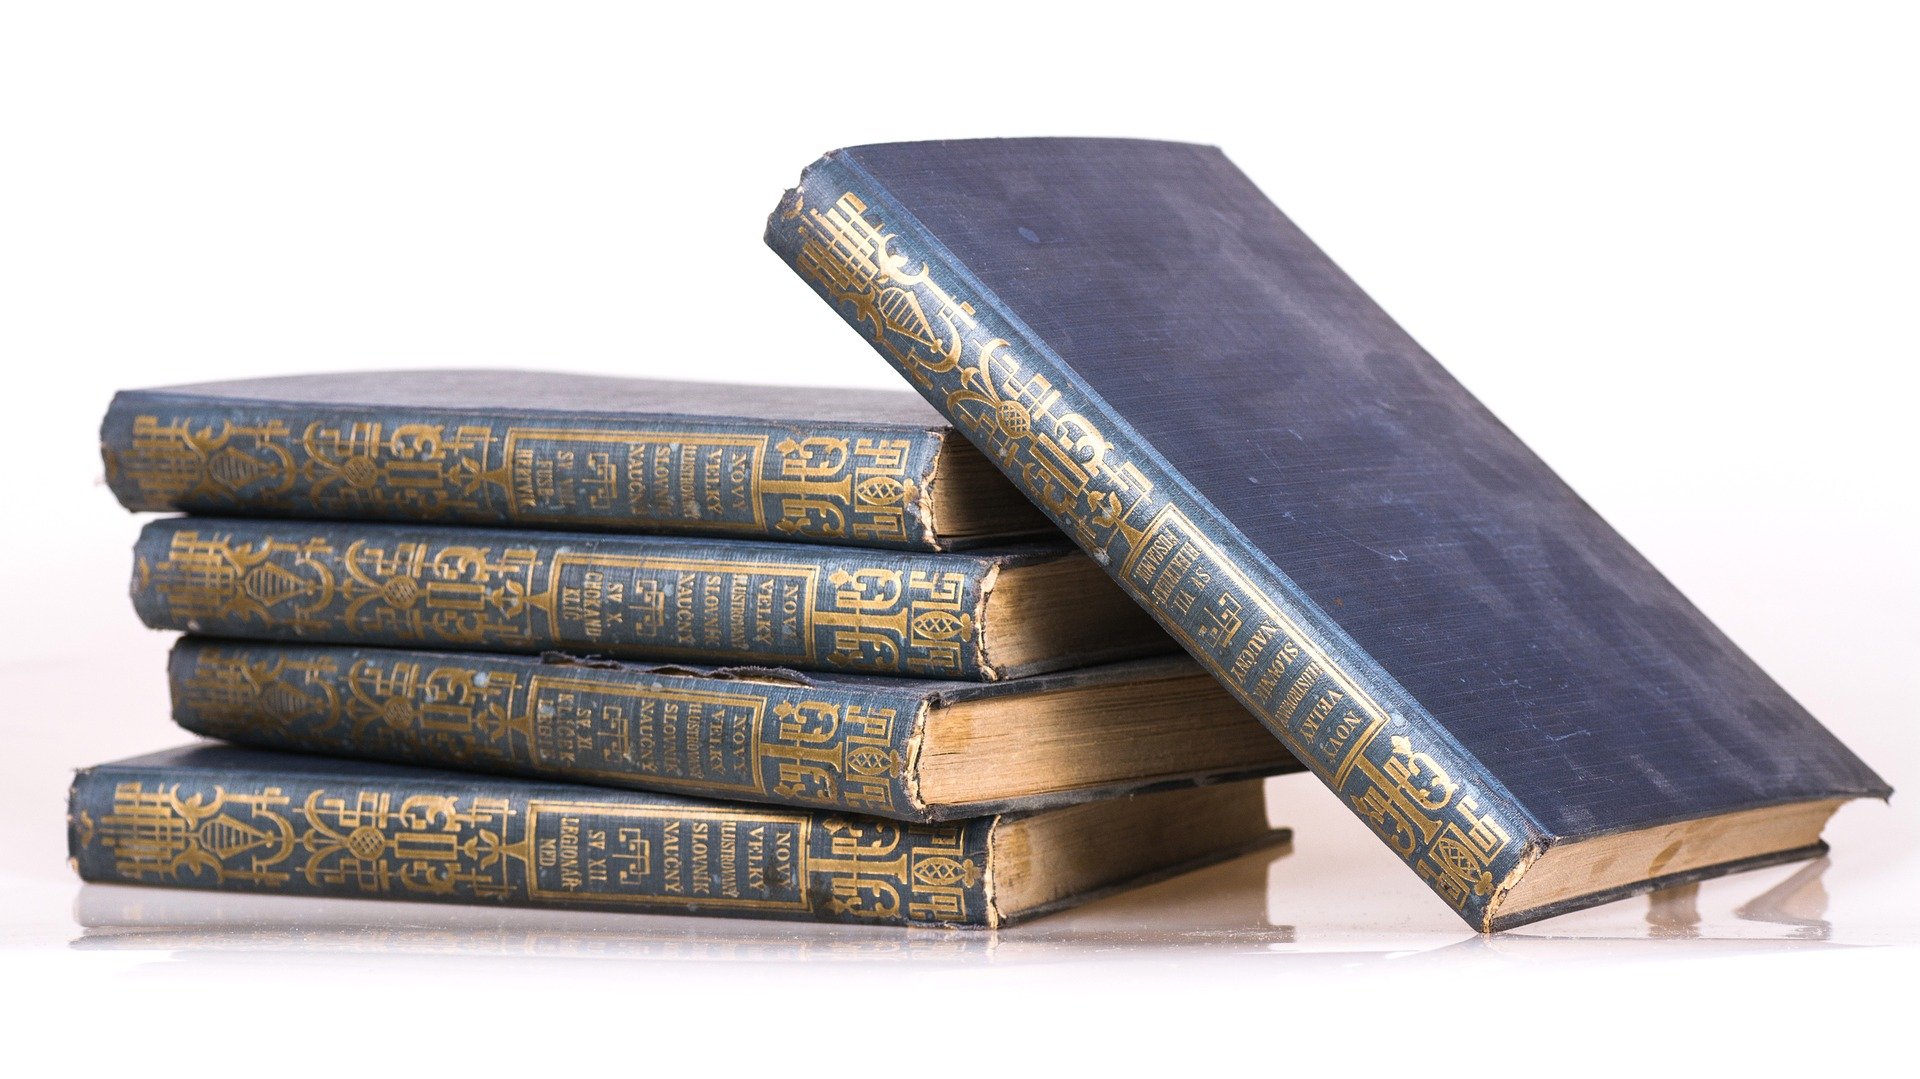 books-1170768_1920